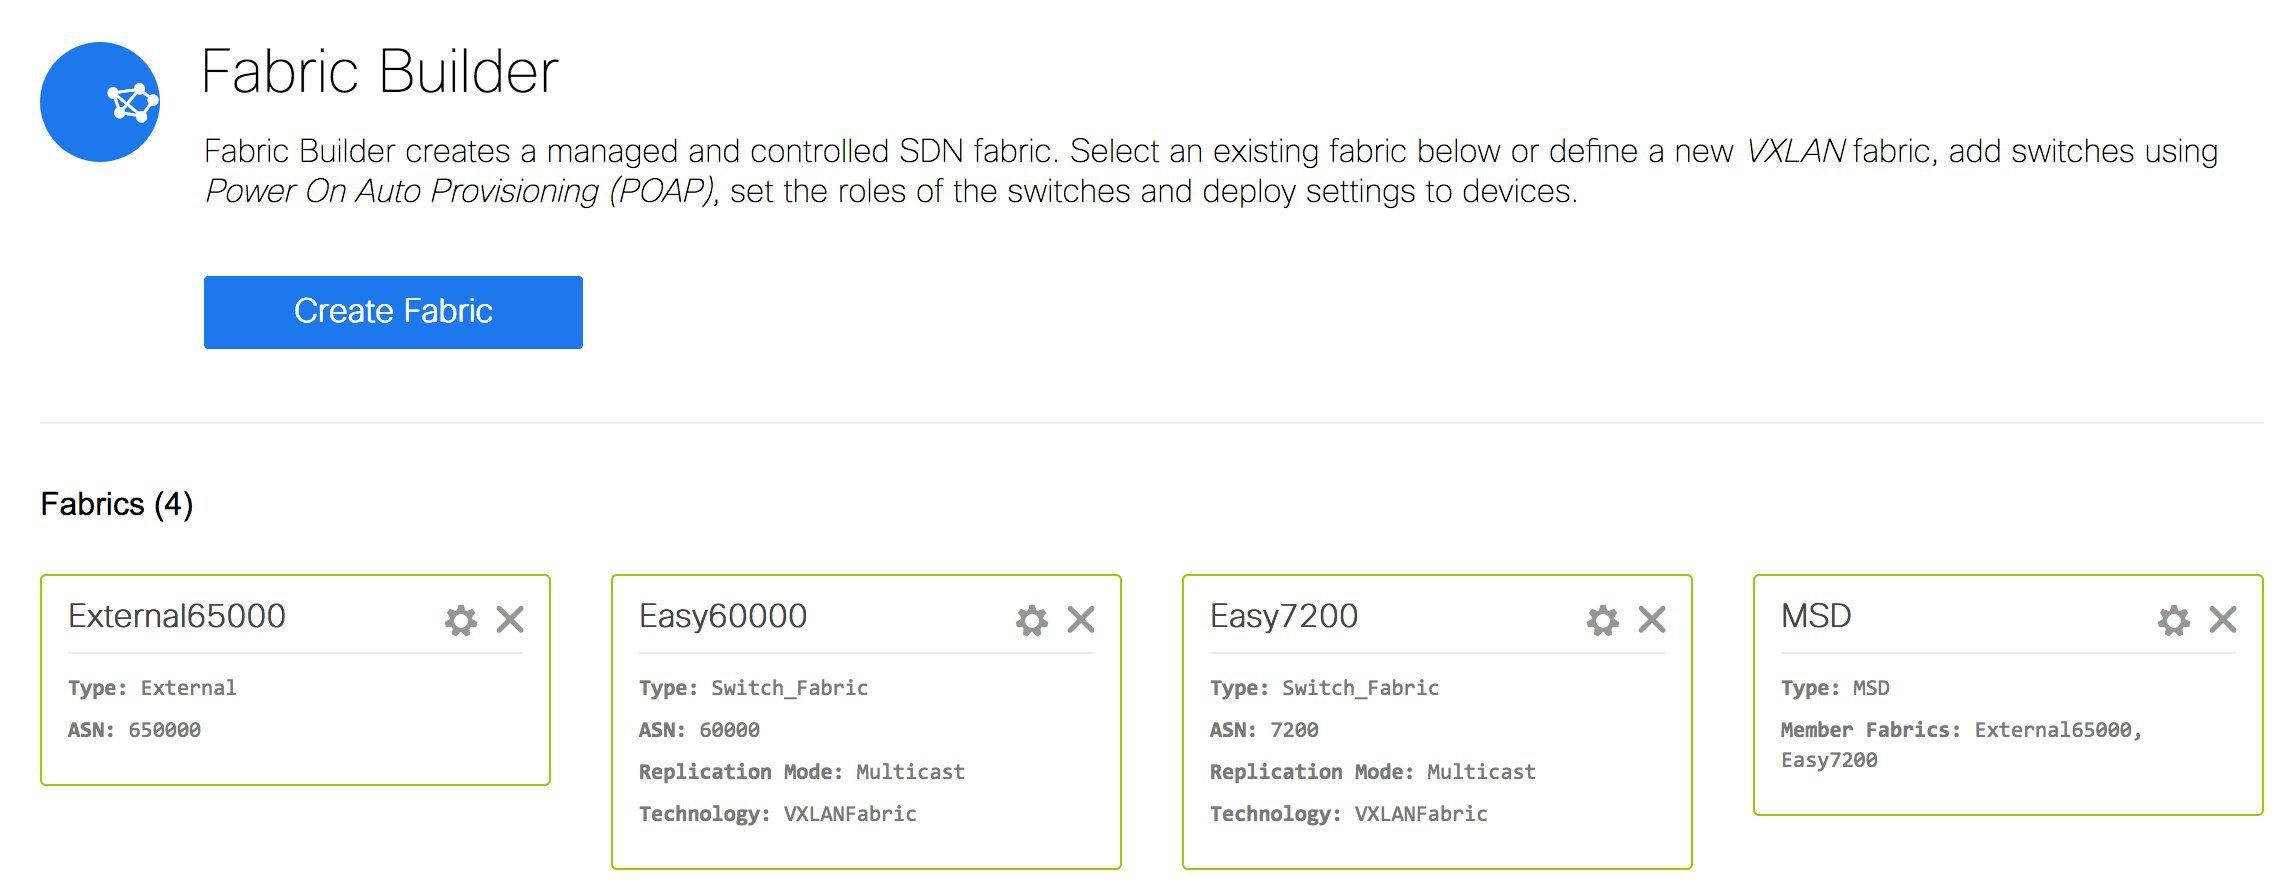 Cisco DCNM LAN Fabric Configuration Guide, Release 11 1(1) - Control